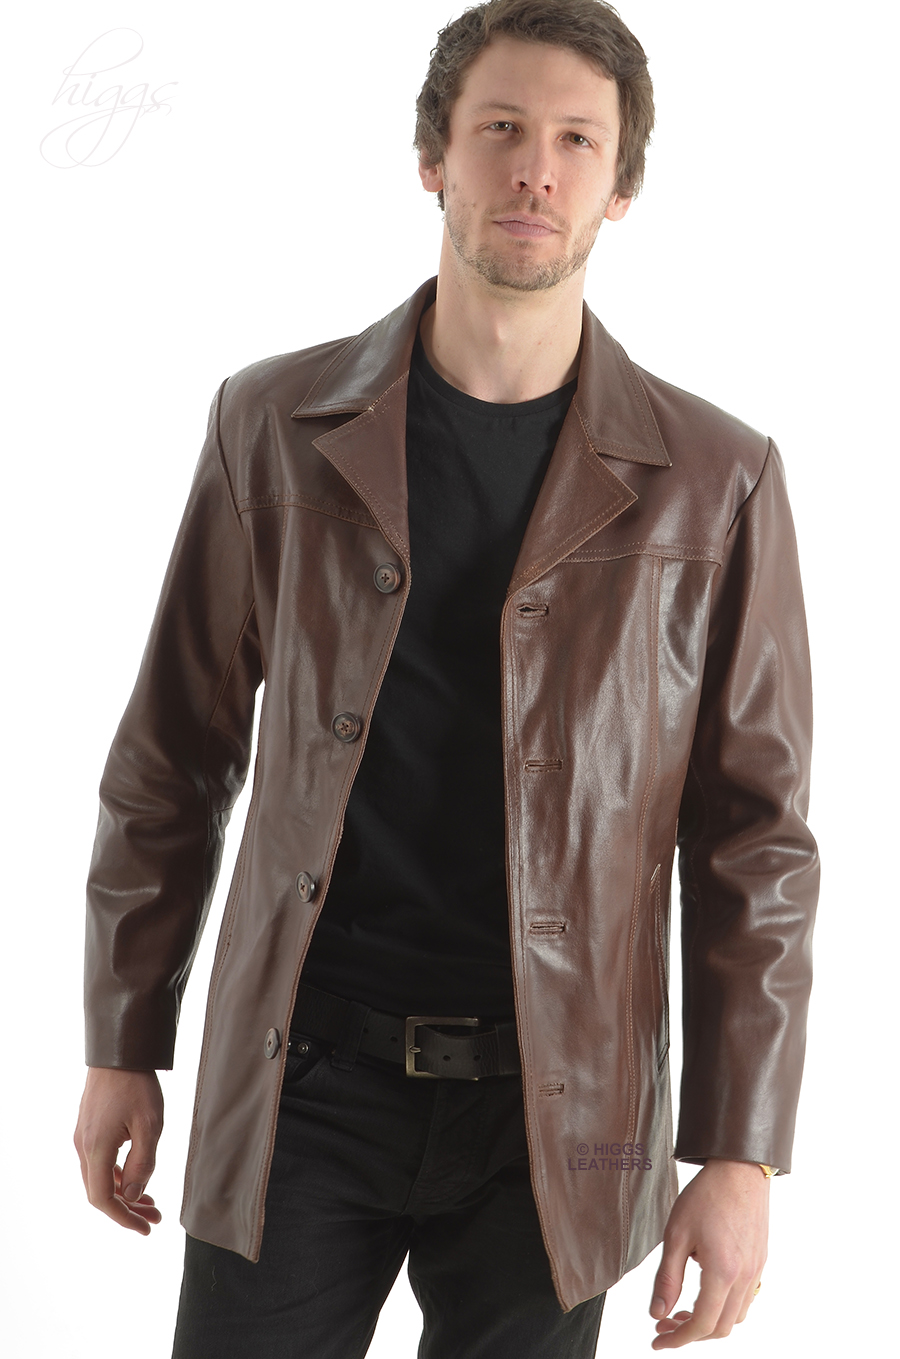 Leather jacket uk mens - Alroy Men S Brown Leather Long Jacket Sold